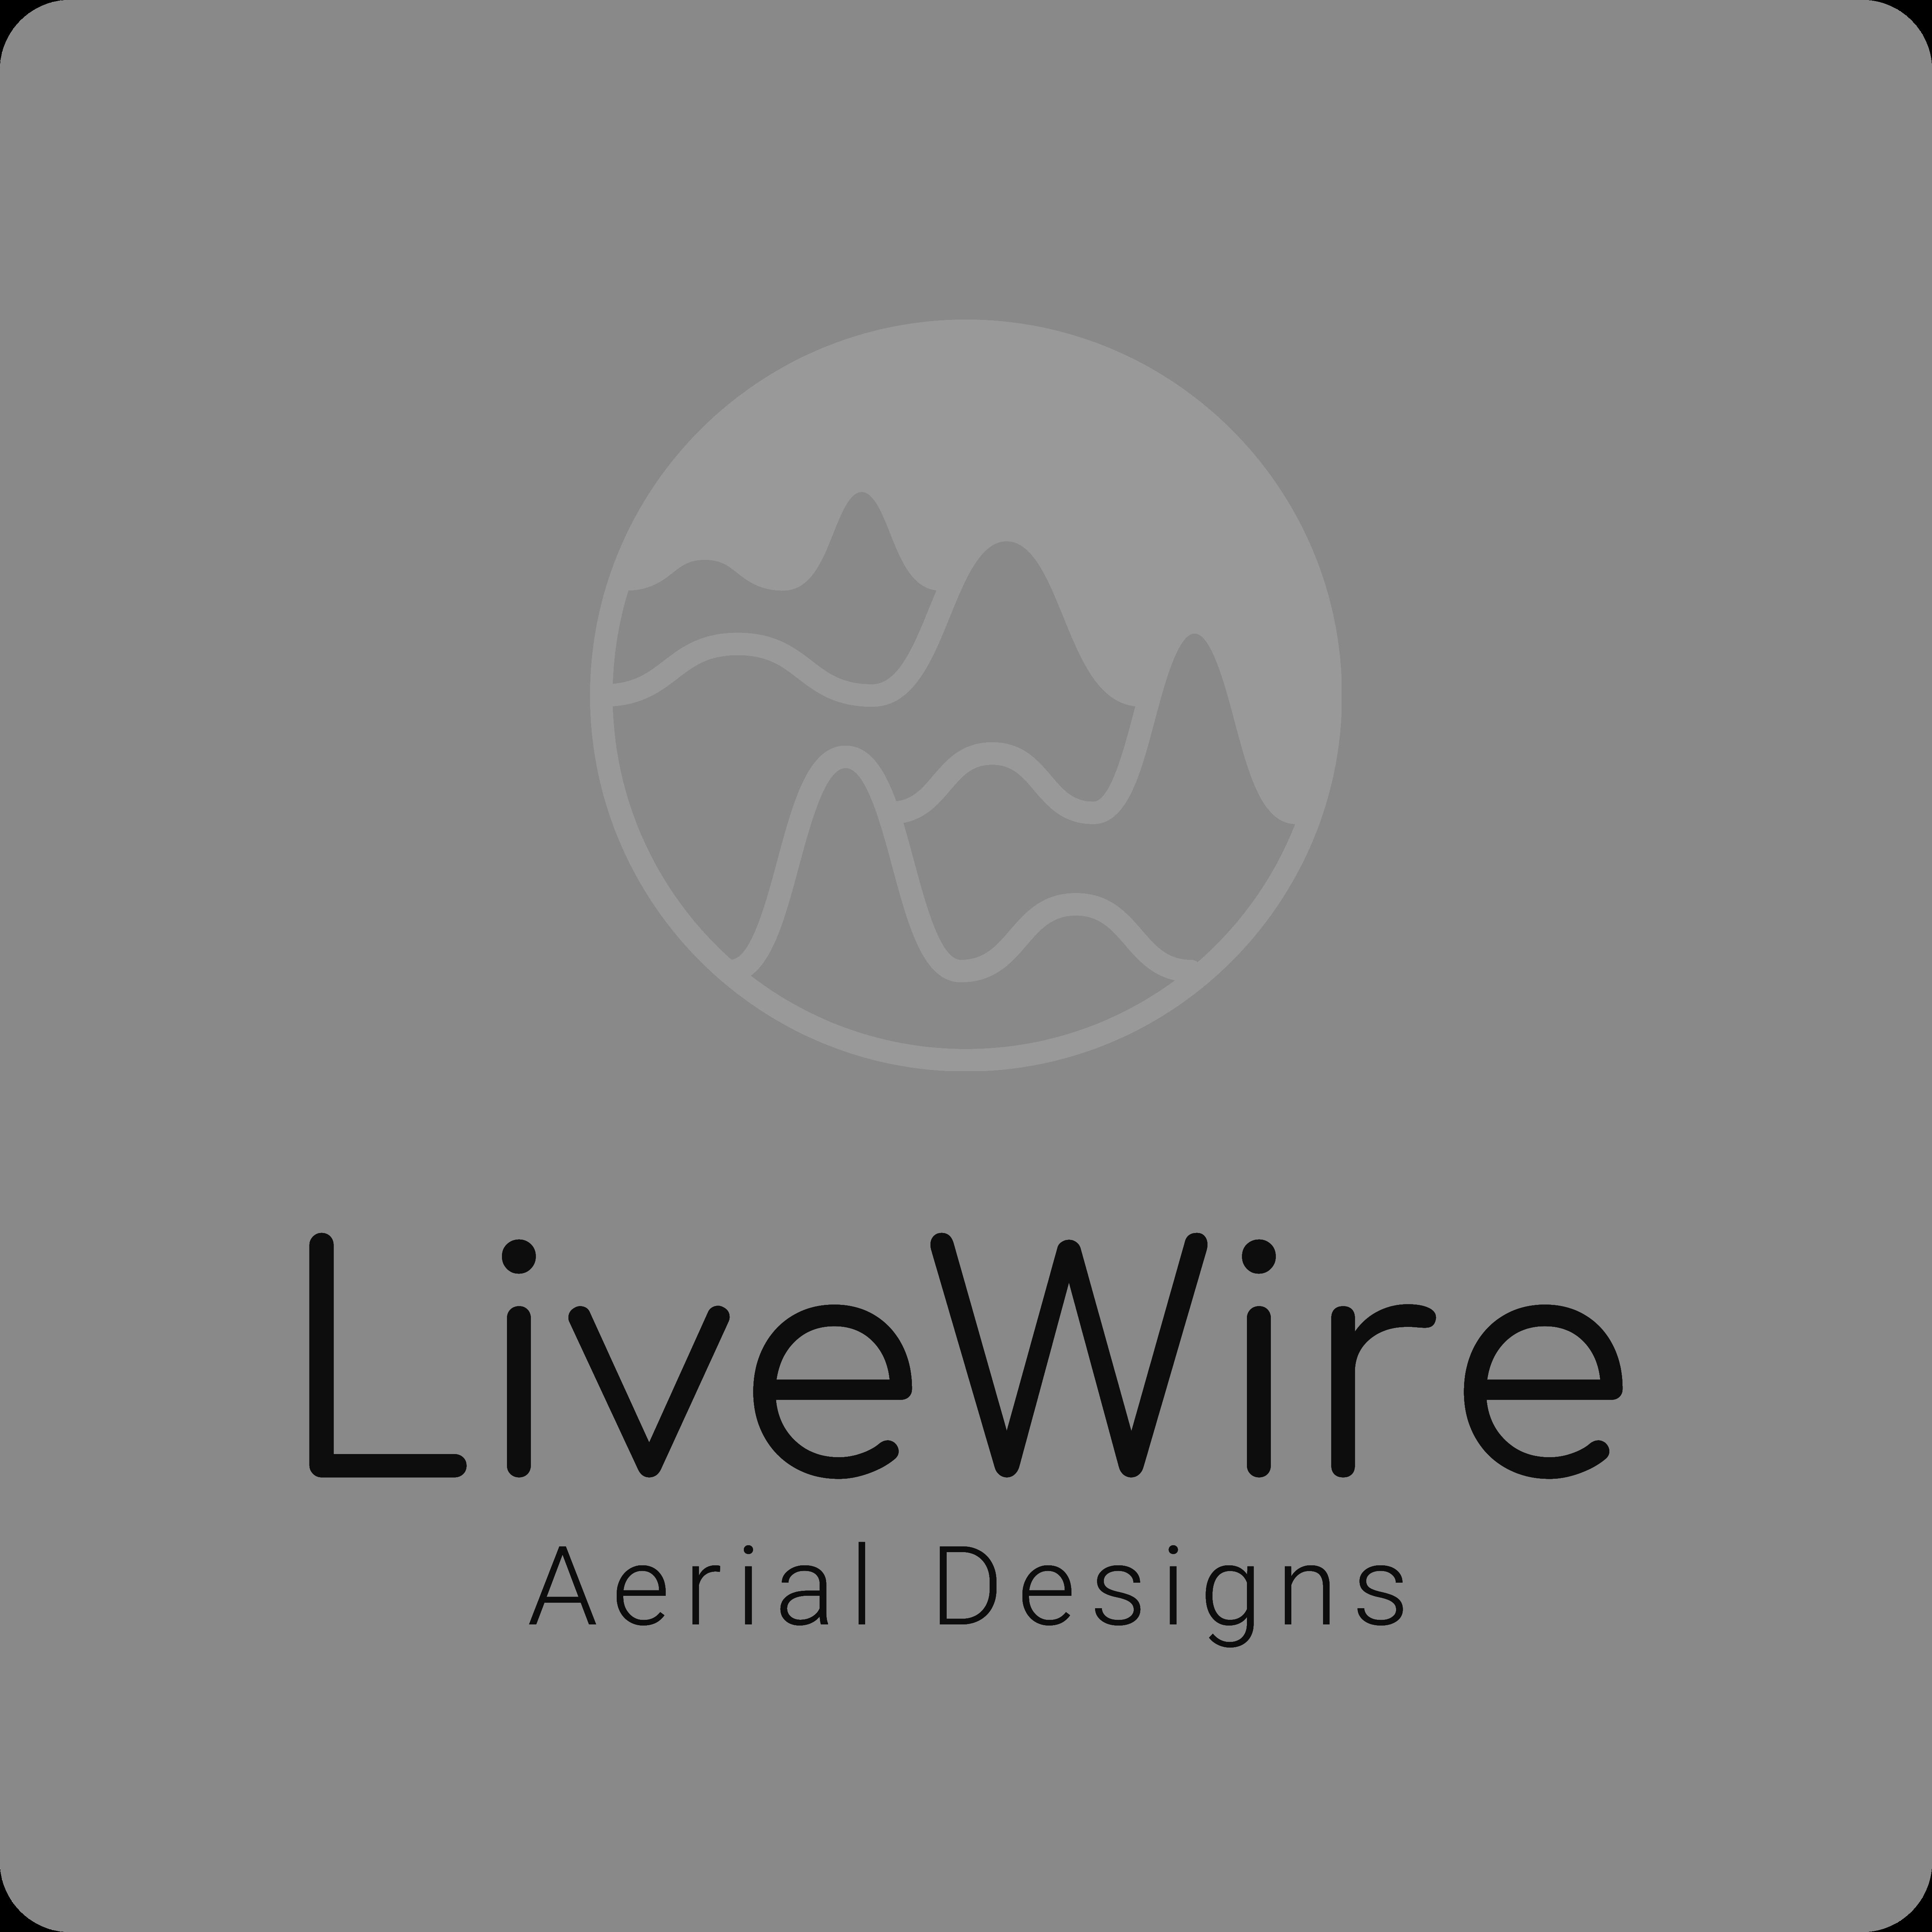 LiveWire Aerial Design image